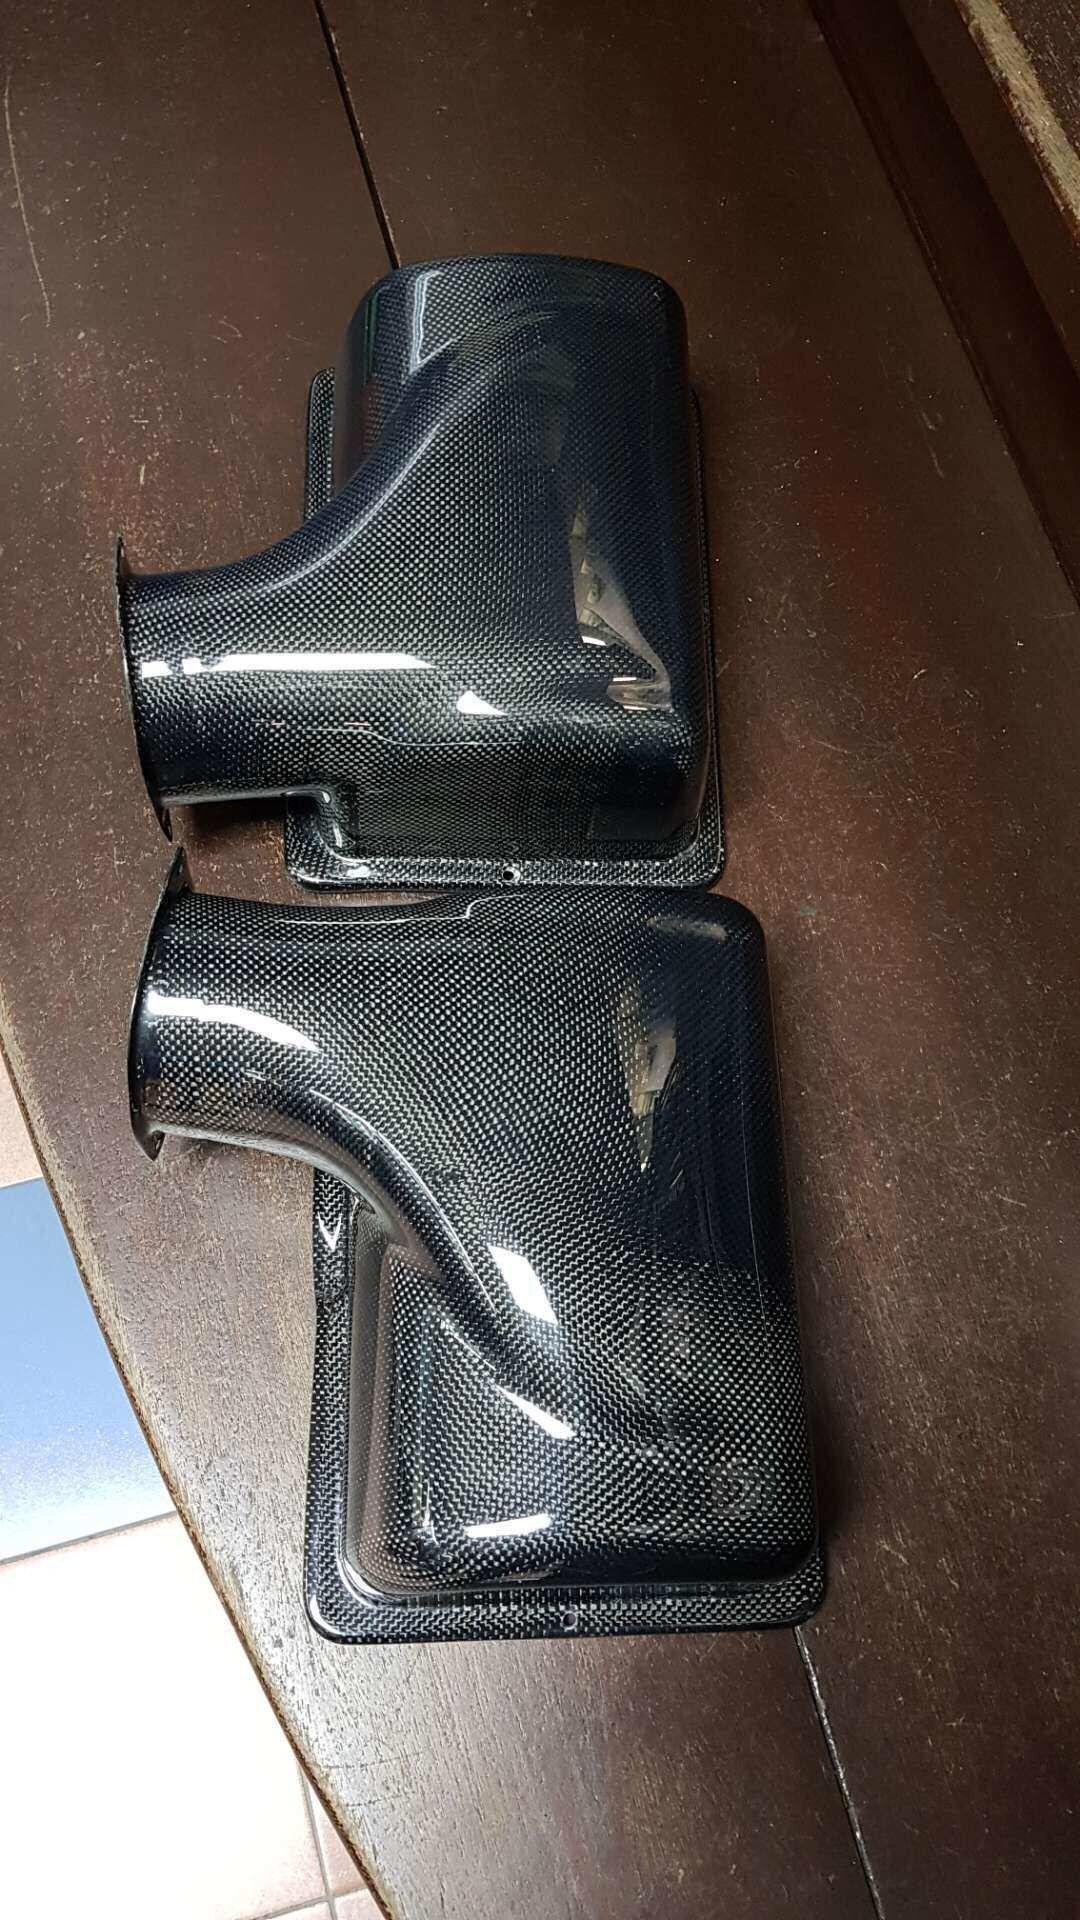 Ferrari 430 Intake Air Box Intake;F430 Air box intake 5